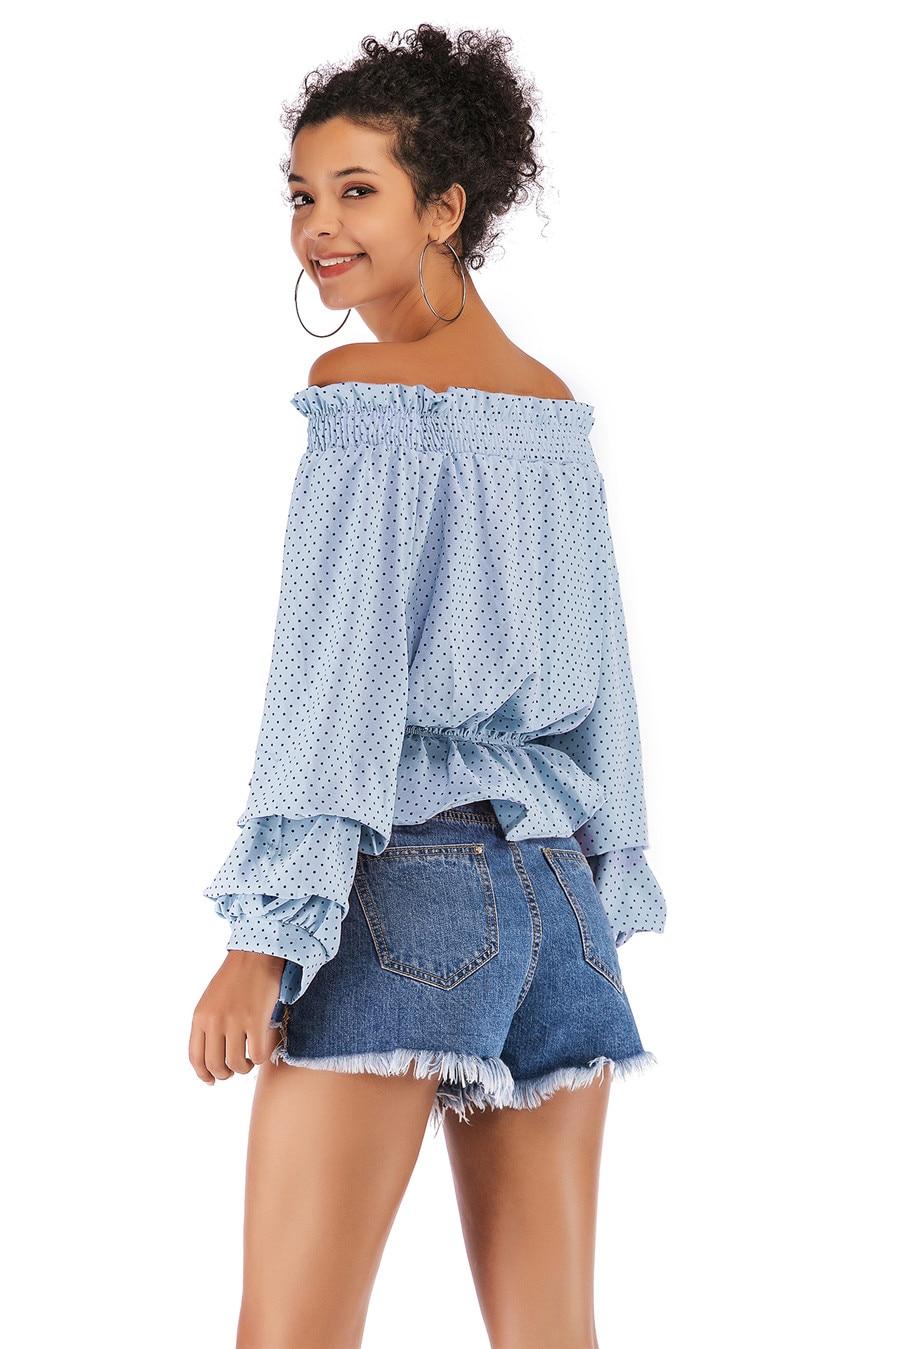 Gladiolus Chiffon Blouse Women 2019 Spring Autumn Long Sleeve Polka Dot Off Shoulder Sexy Blouses Women Shirts Ruffles Blusas (20)